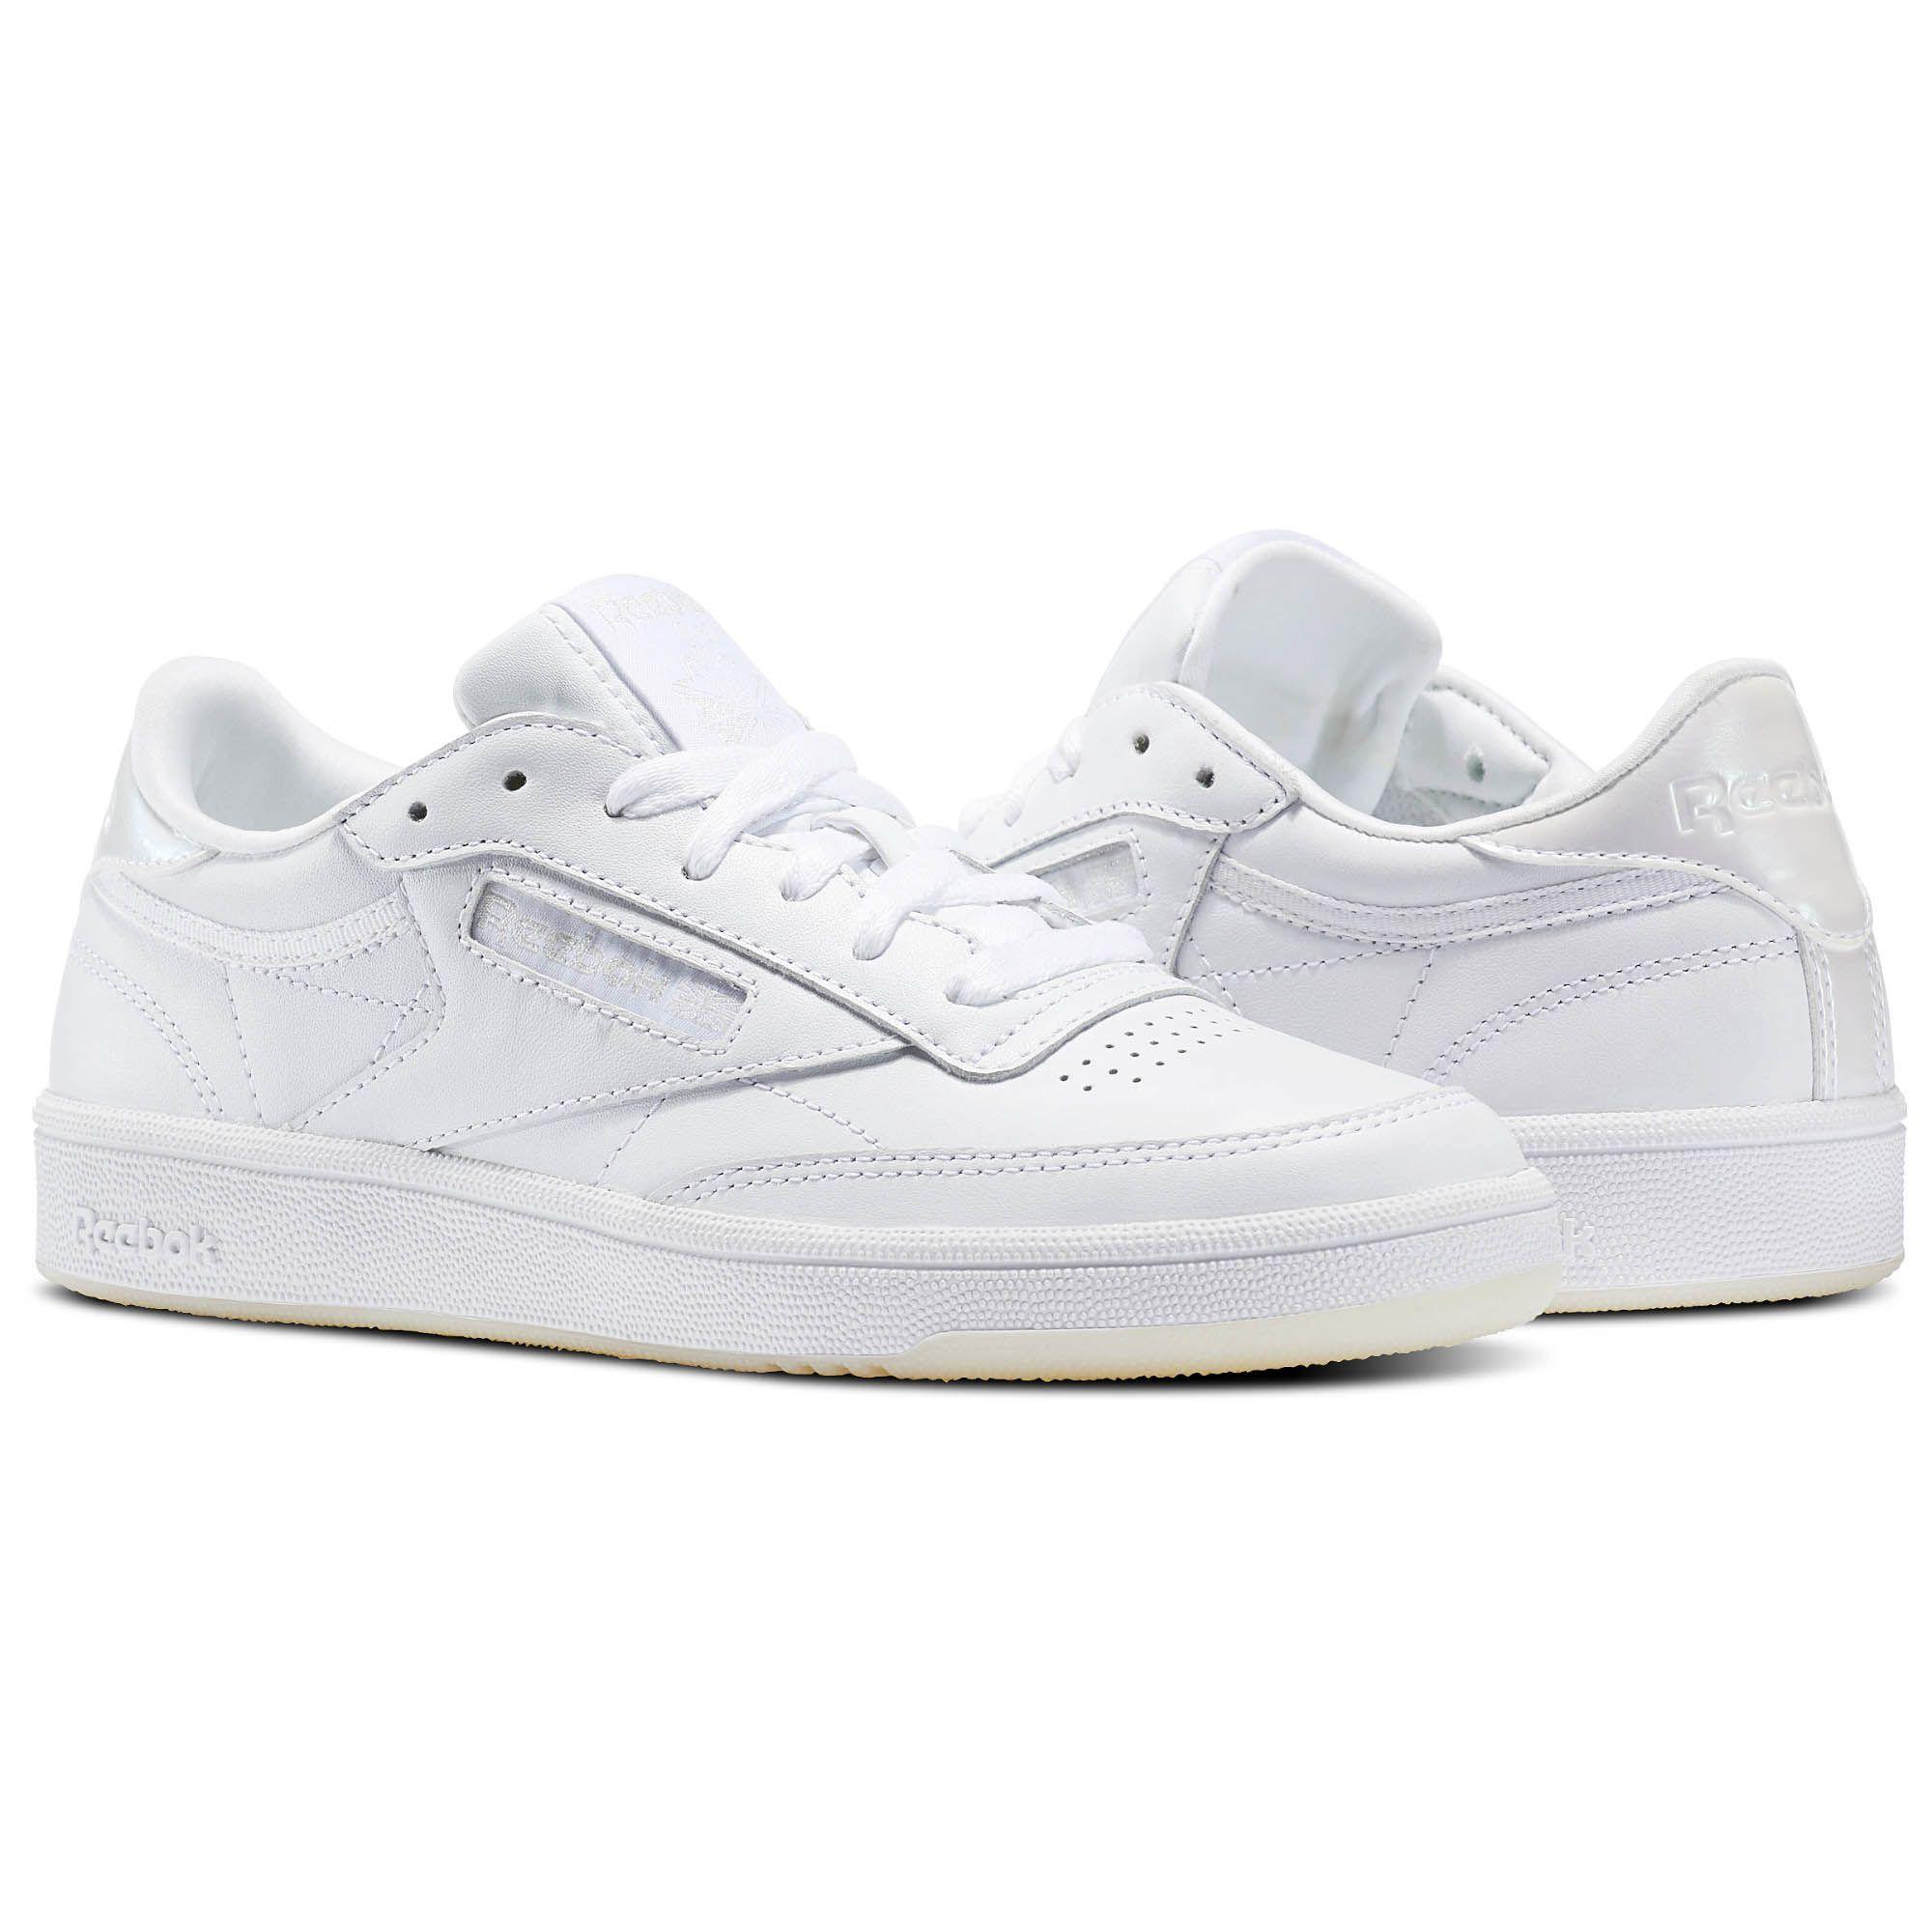 Womens Club C 85 Ultk Low-Top Sneakers Reebok U4jzi